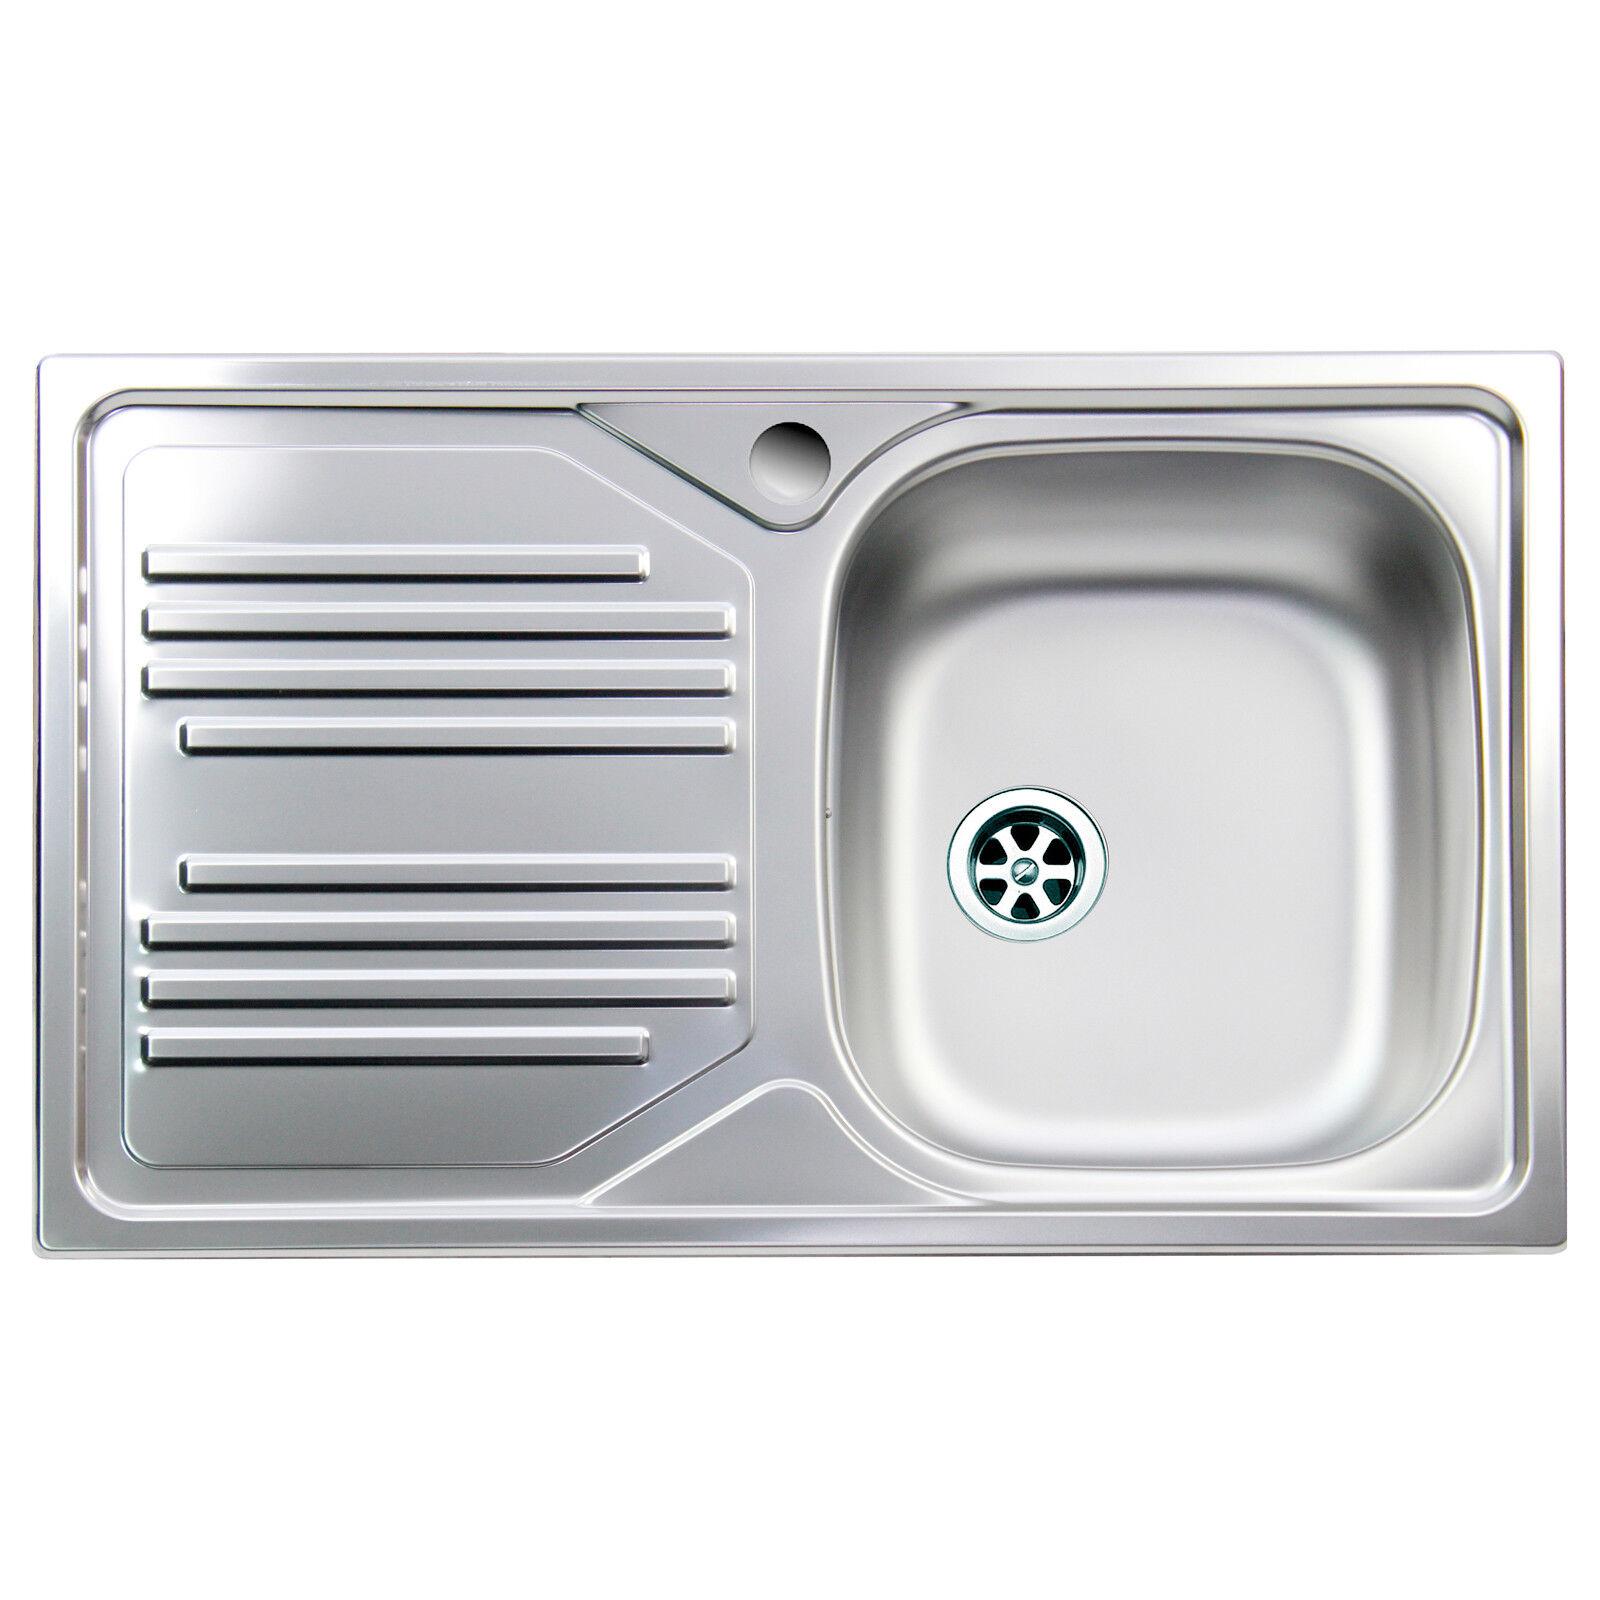 Lavello cucina acciaio inox Apell Atmosfera vasca singola gocciolatoio sinistra